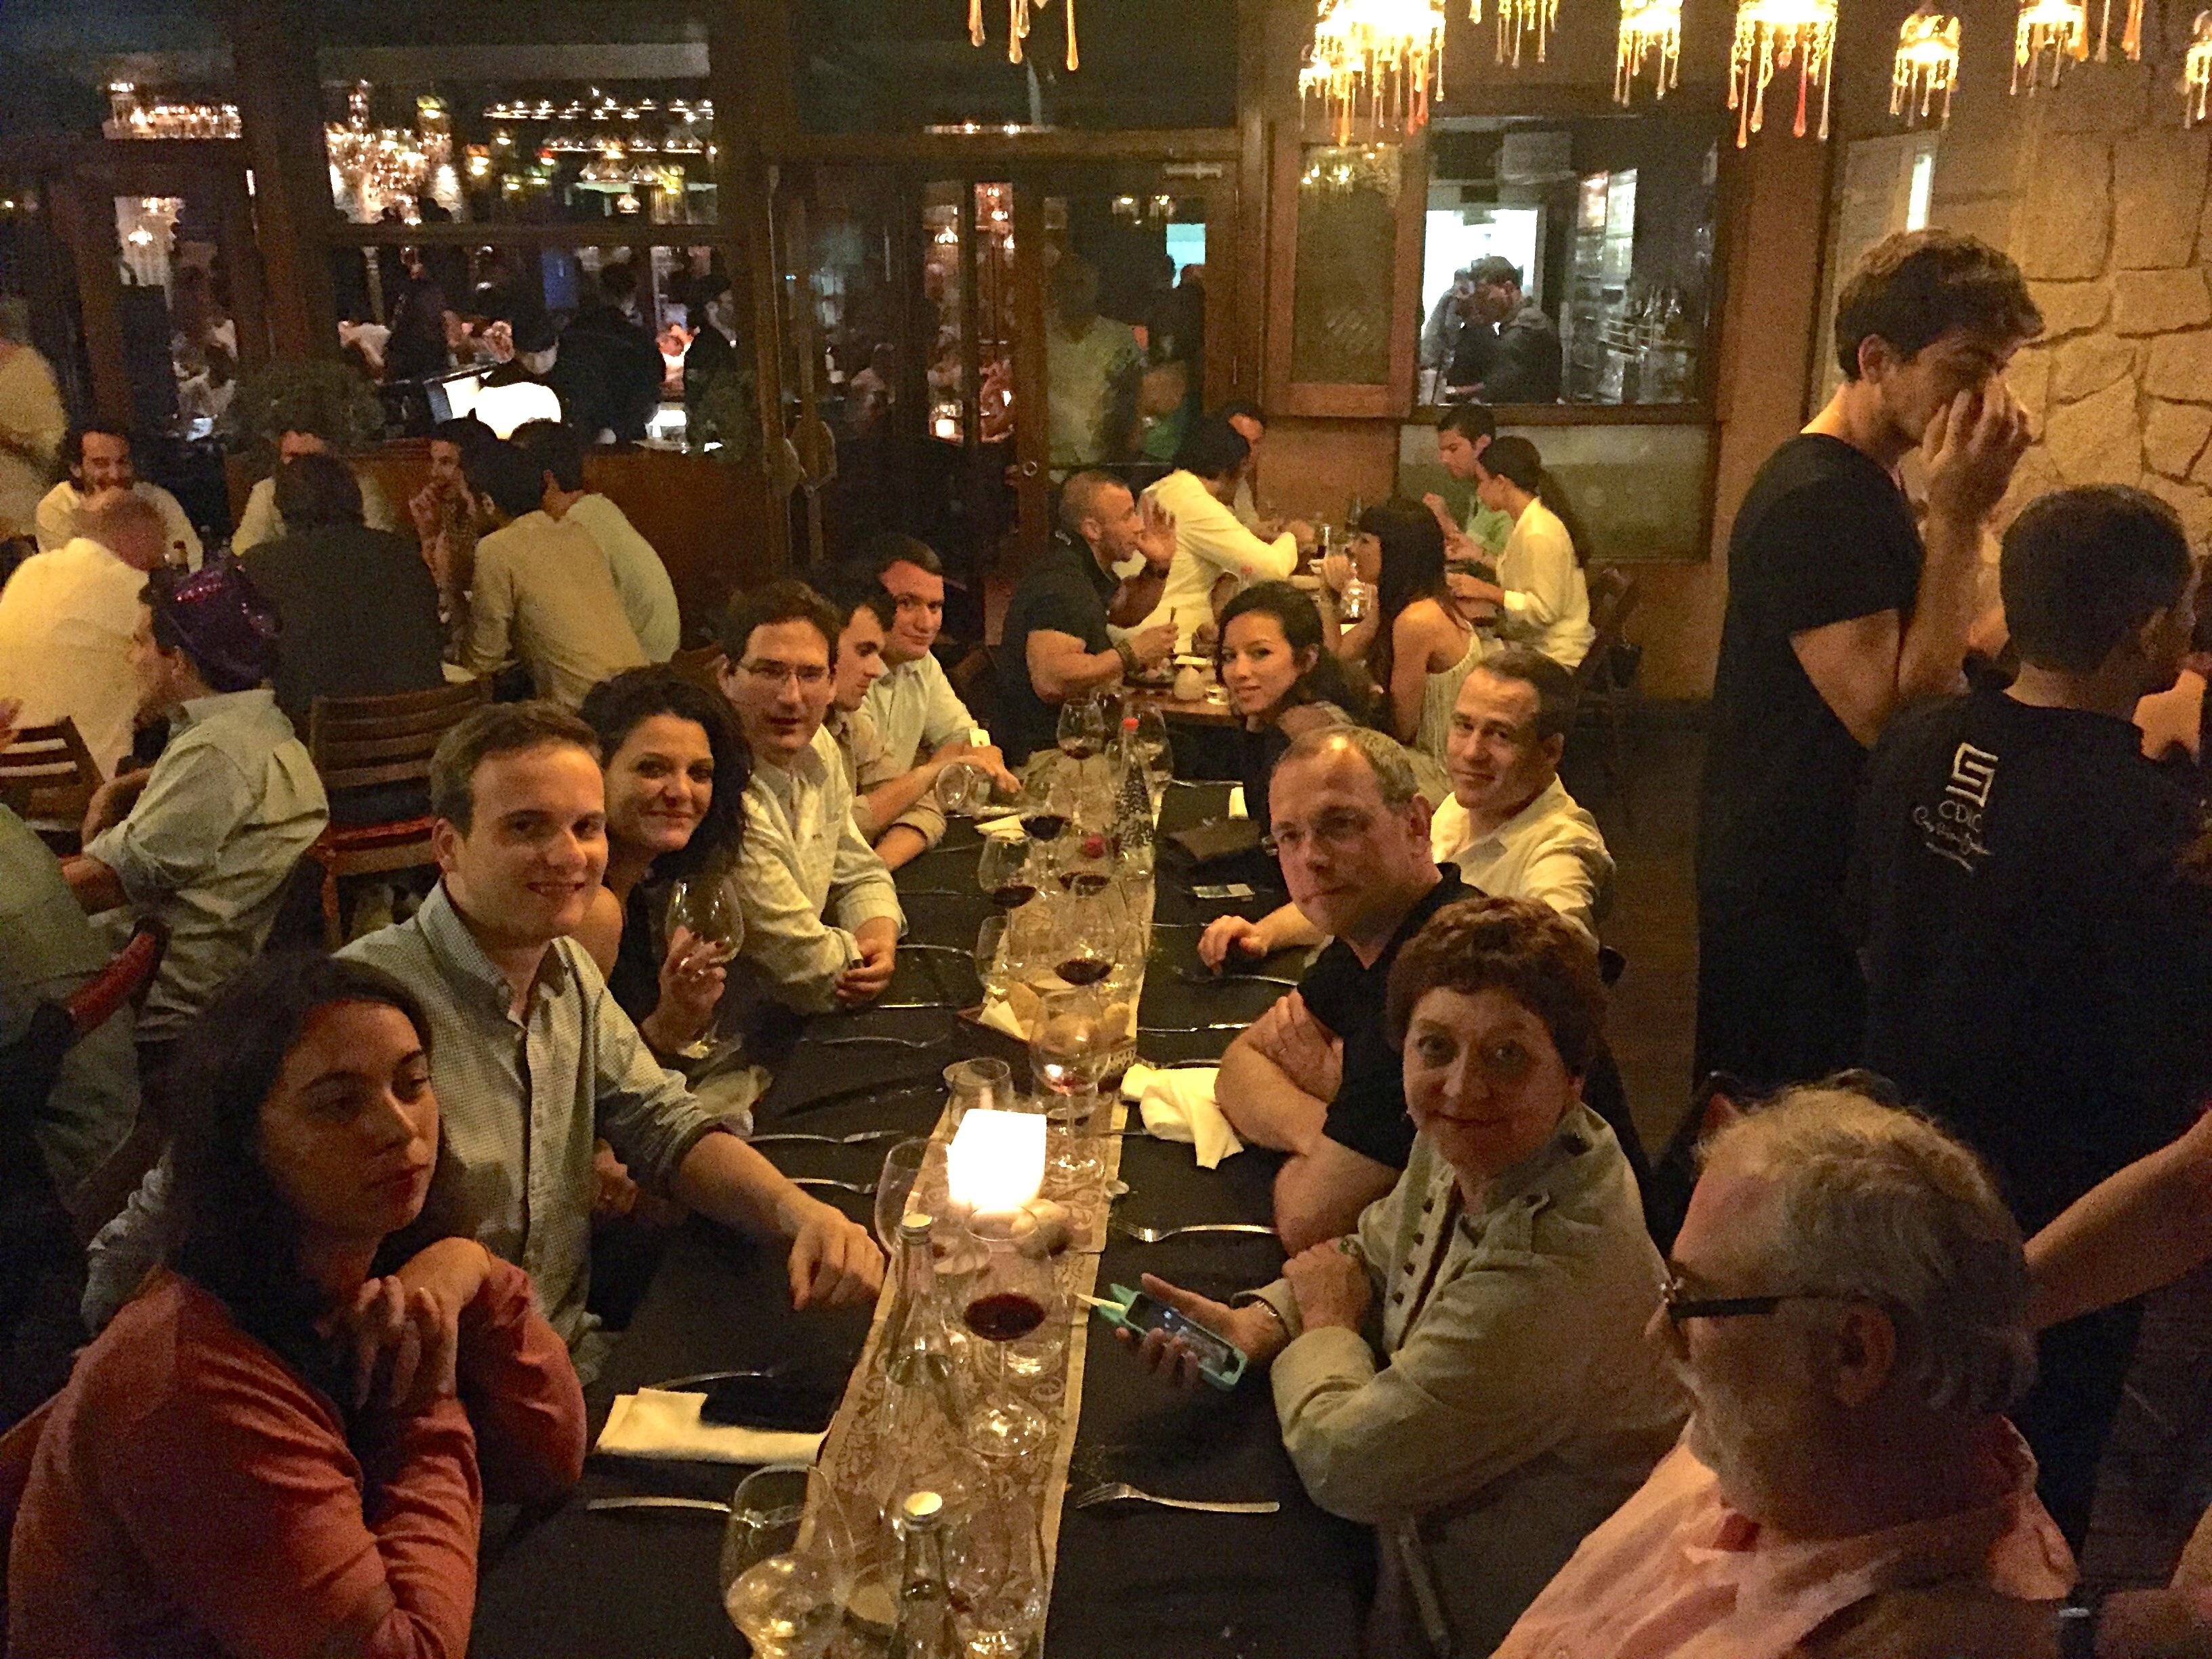 L'équipe au restaurant CDLC à Barcelone